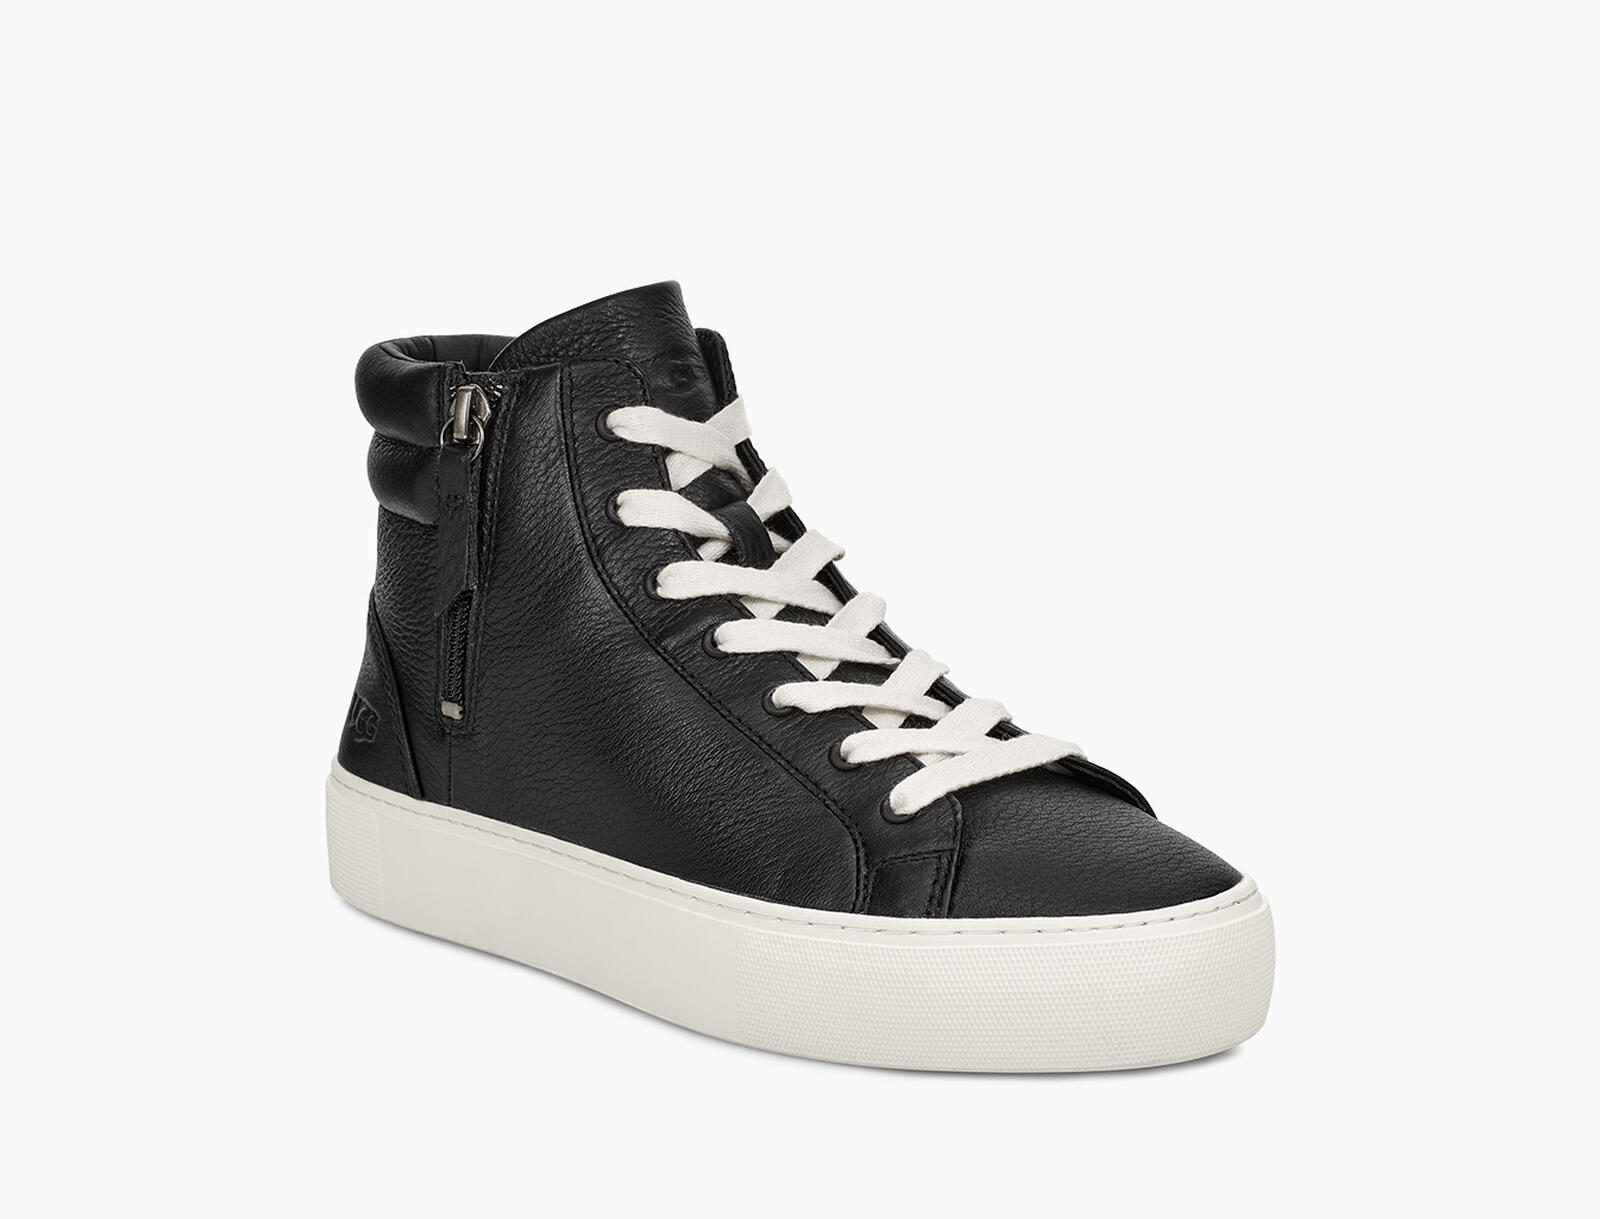 Olli Leather Trainer